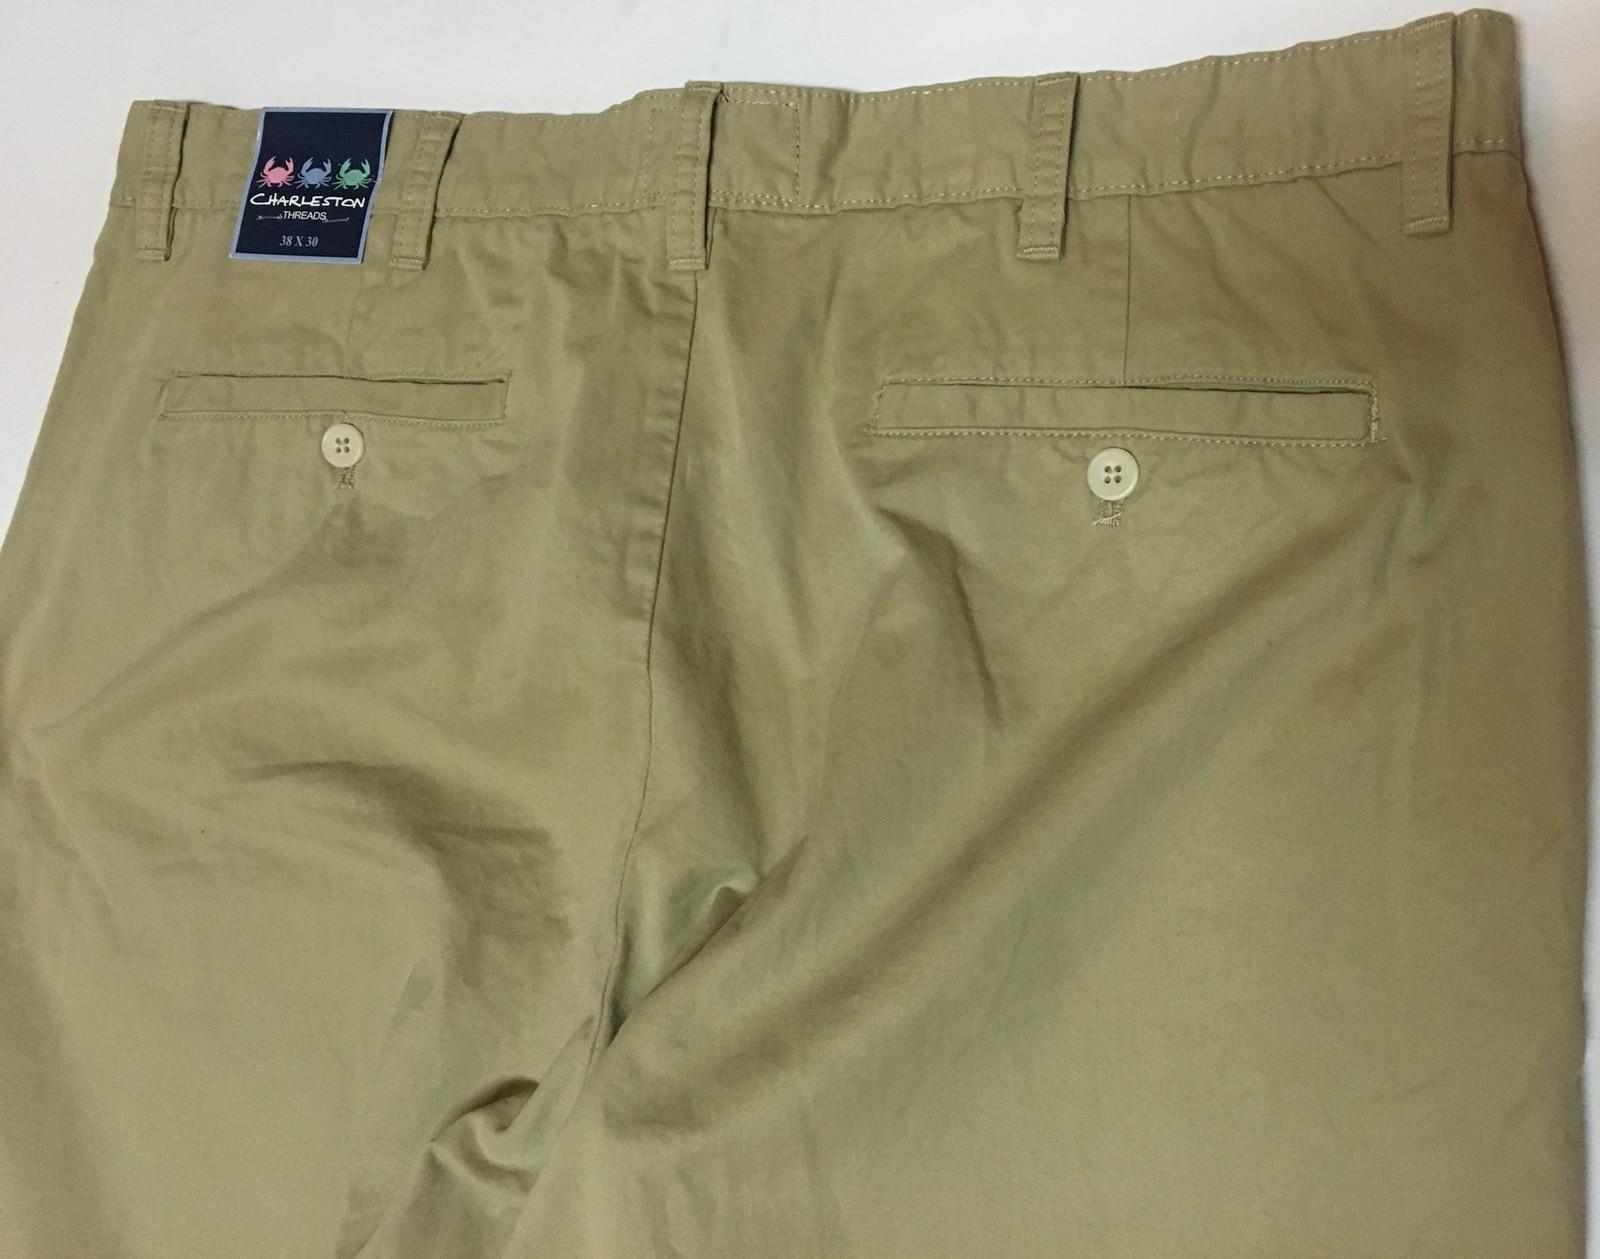 Charleston Threads Men's Khakis Pants 38 x 30 NWT